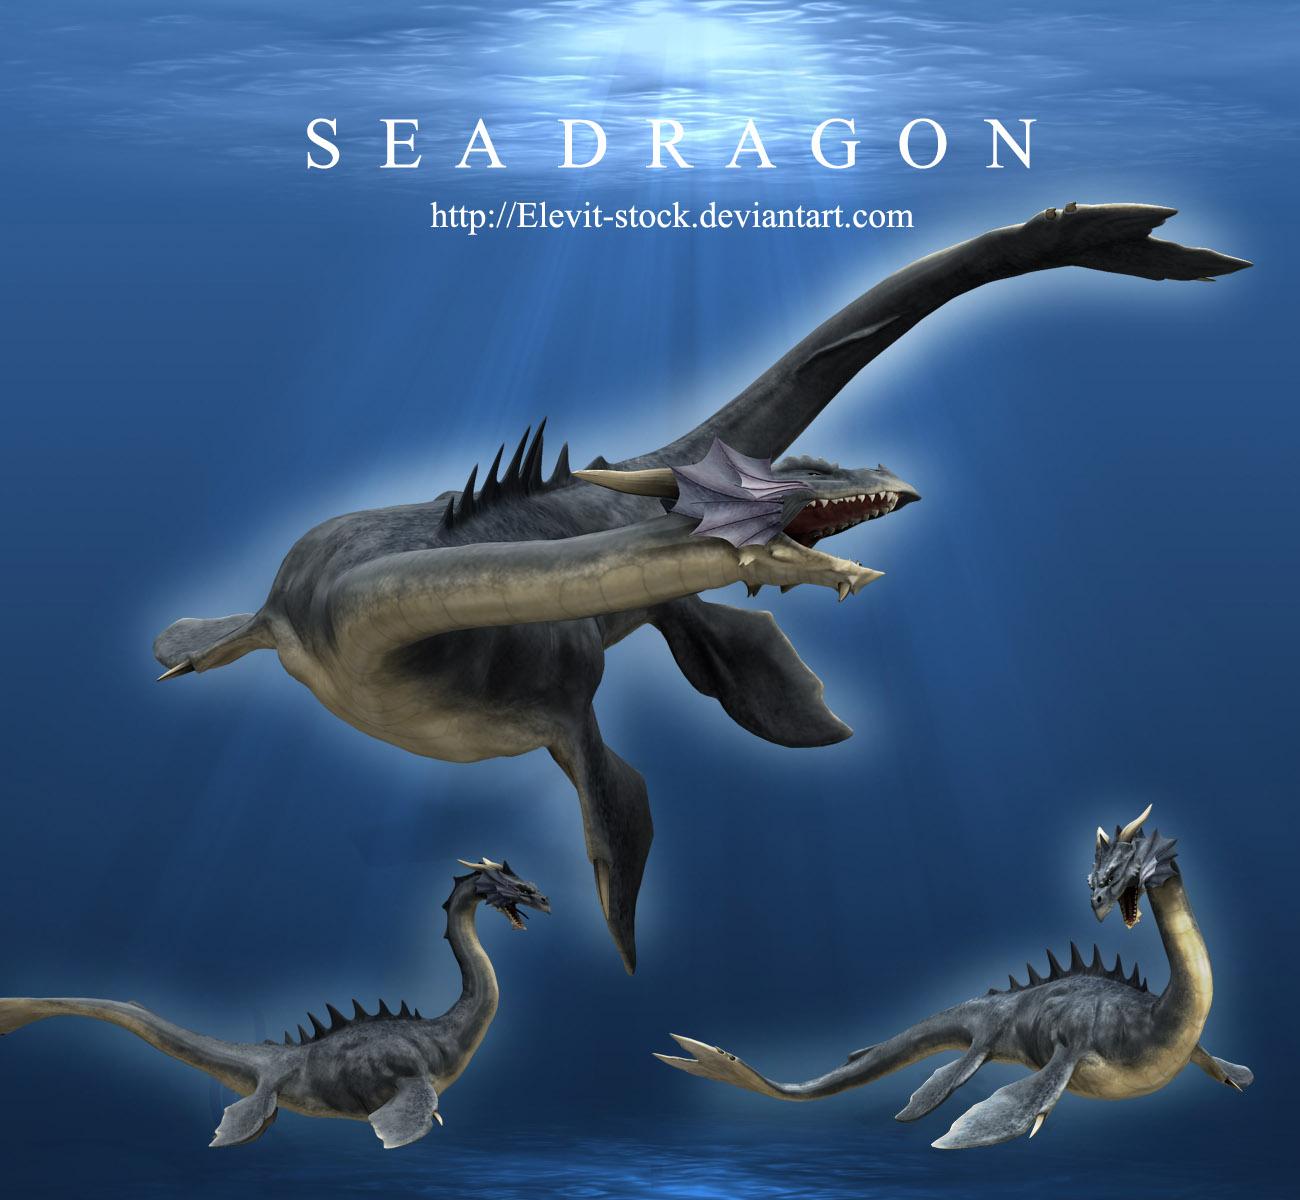 Sea Dragon by Elevit-Stock